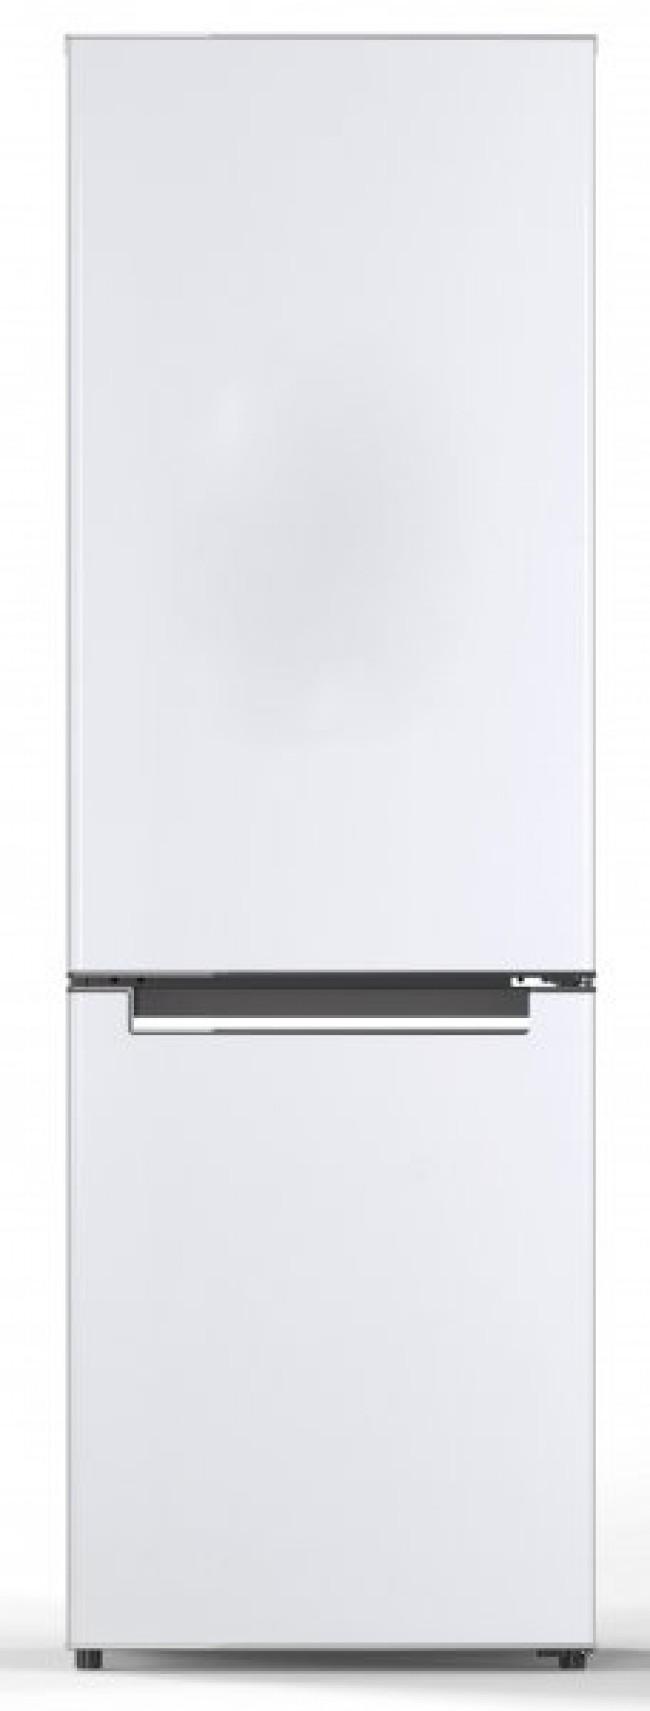 Хладилник Crown CBR250 A+